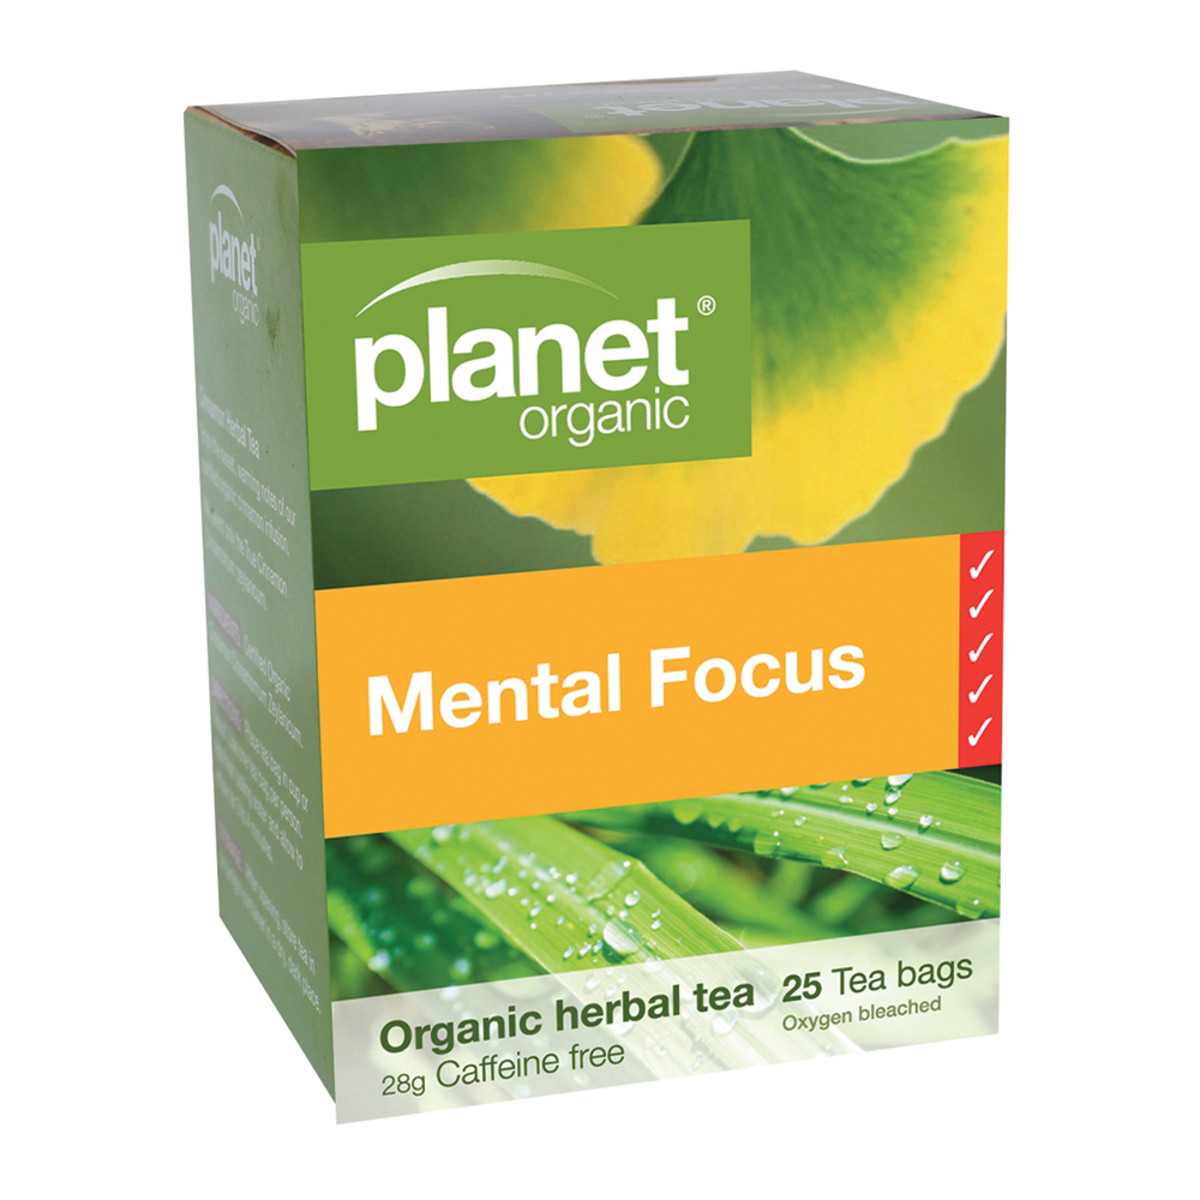 PLANET ORGANIC MENTAL FOCUS TEA ORG 25TB